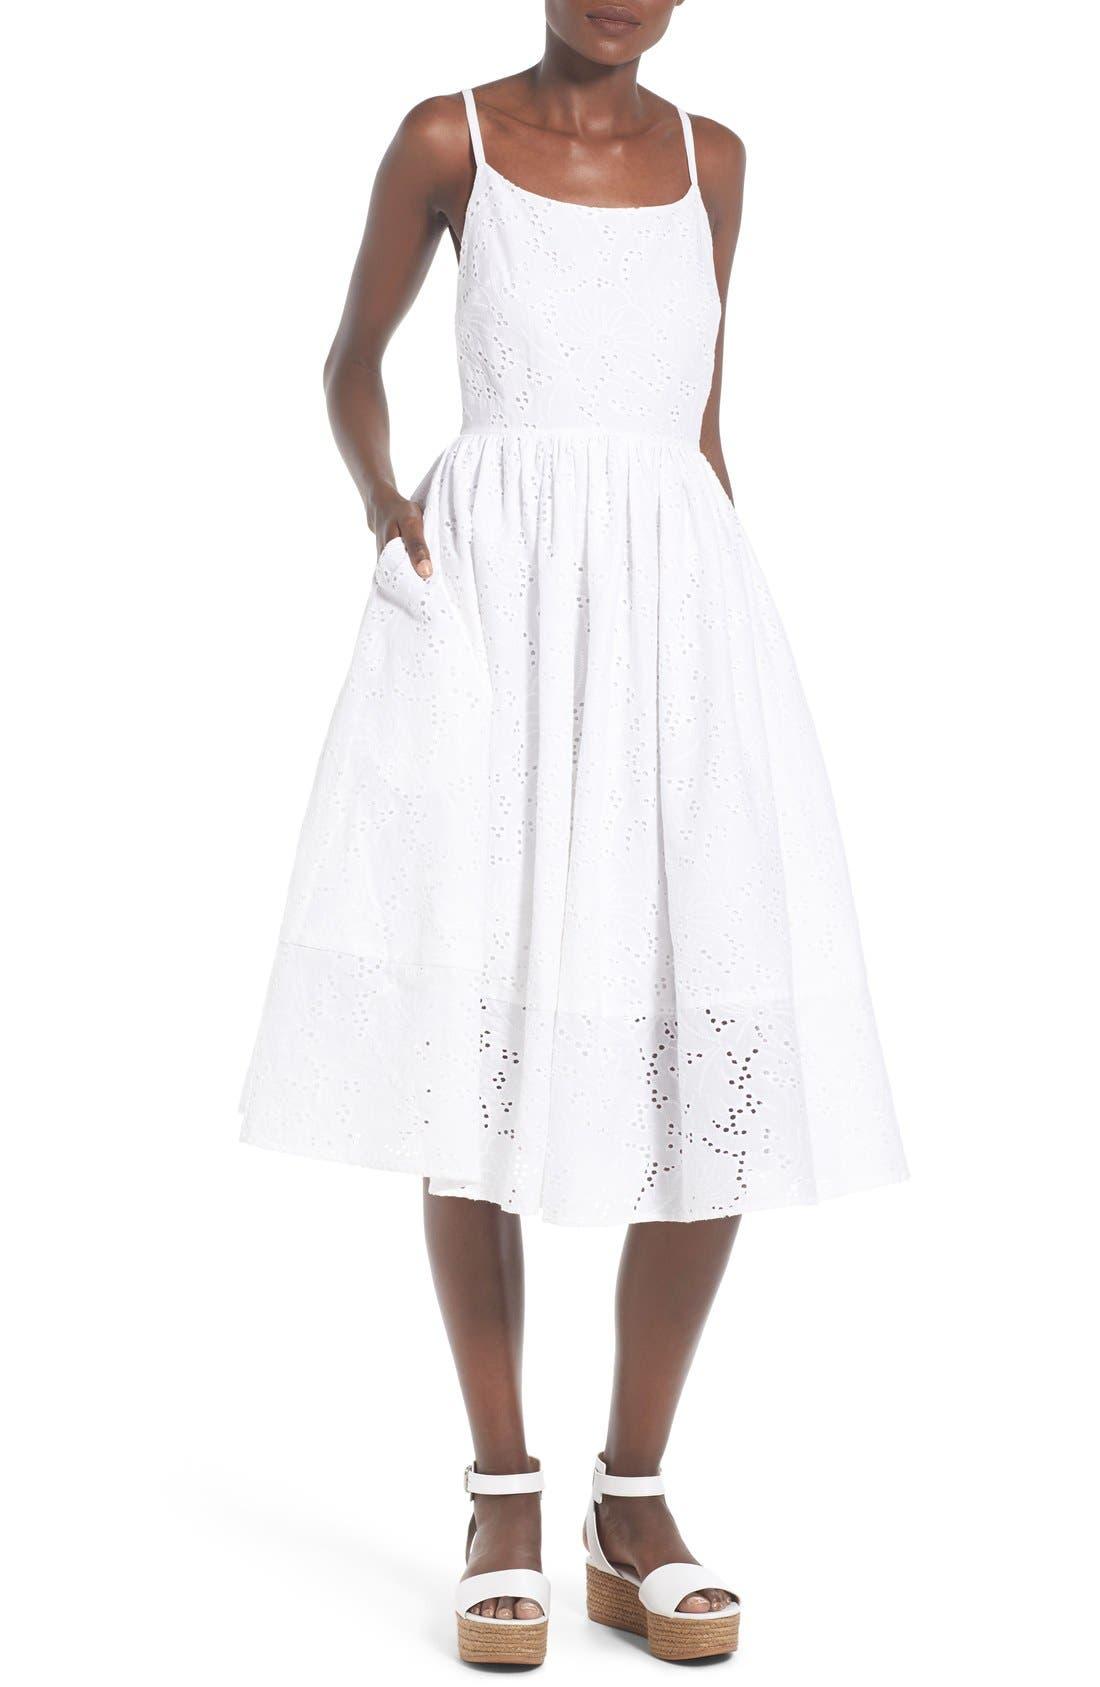 Main Image - Rachel Antonoff 'Melissa' Cotton Eyelet Fit & Flare Dress